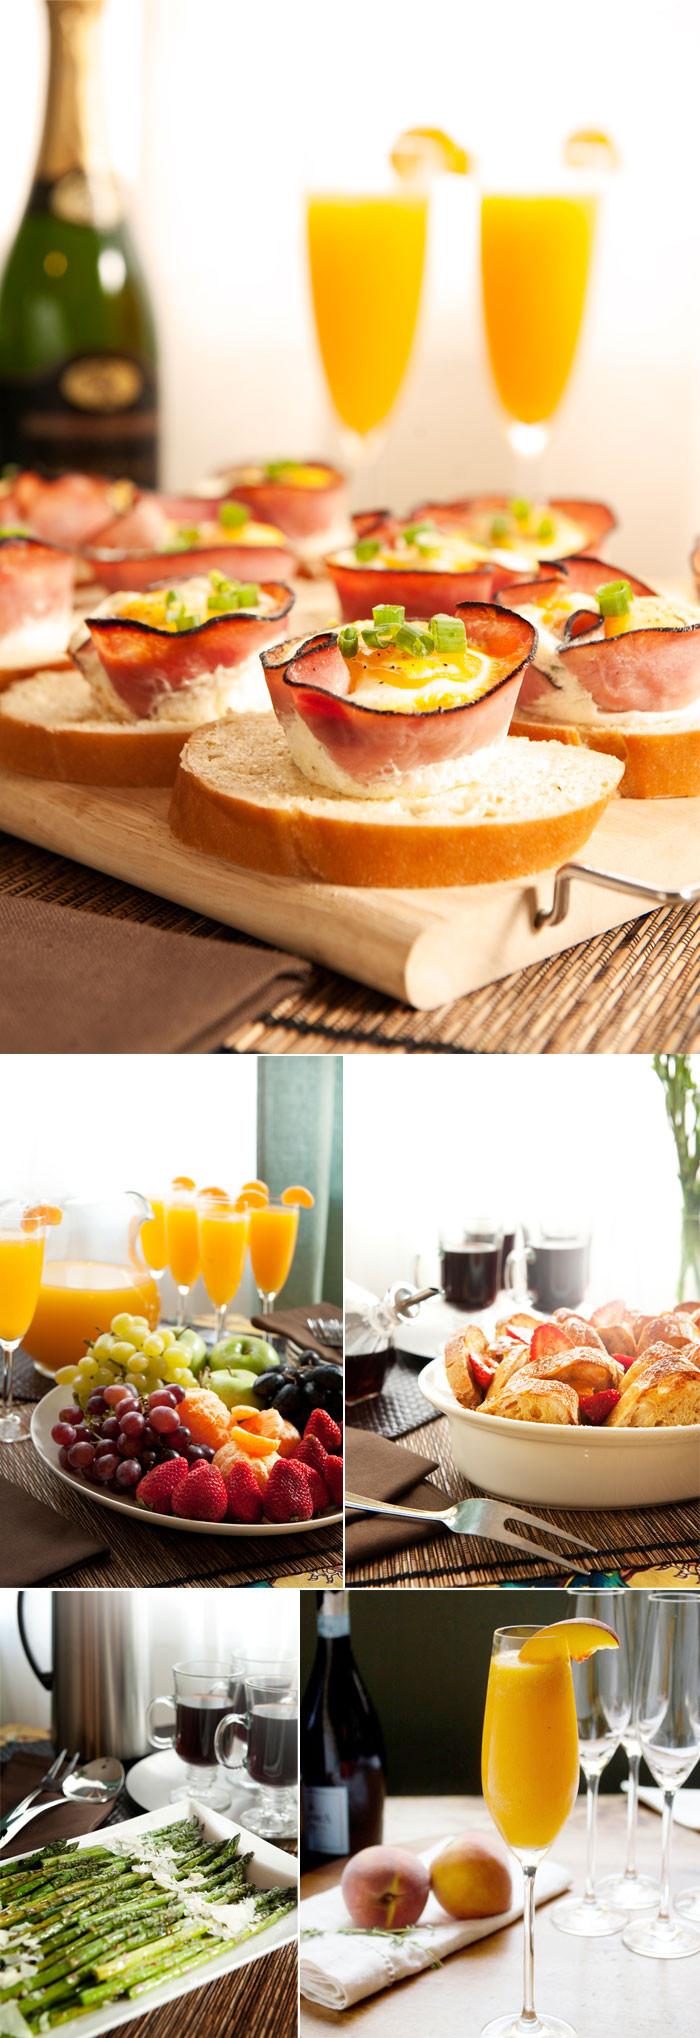 Breakfast Food Recipes  Hosting an Engagement Brunch